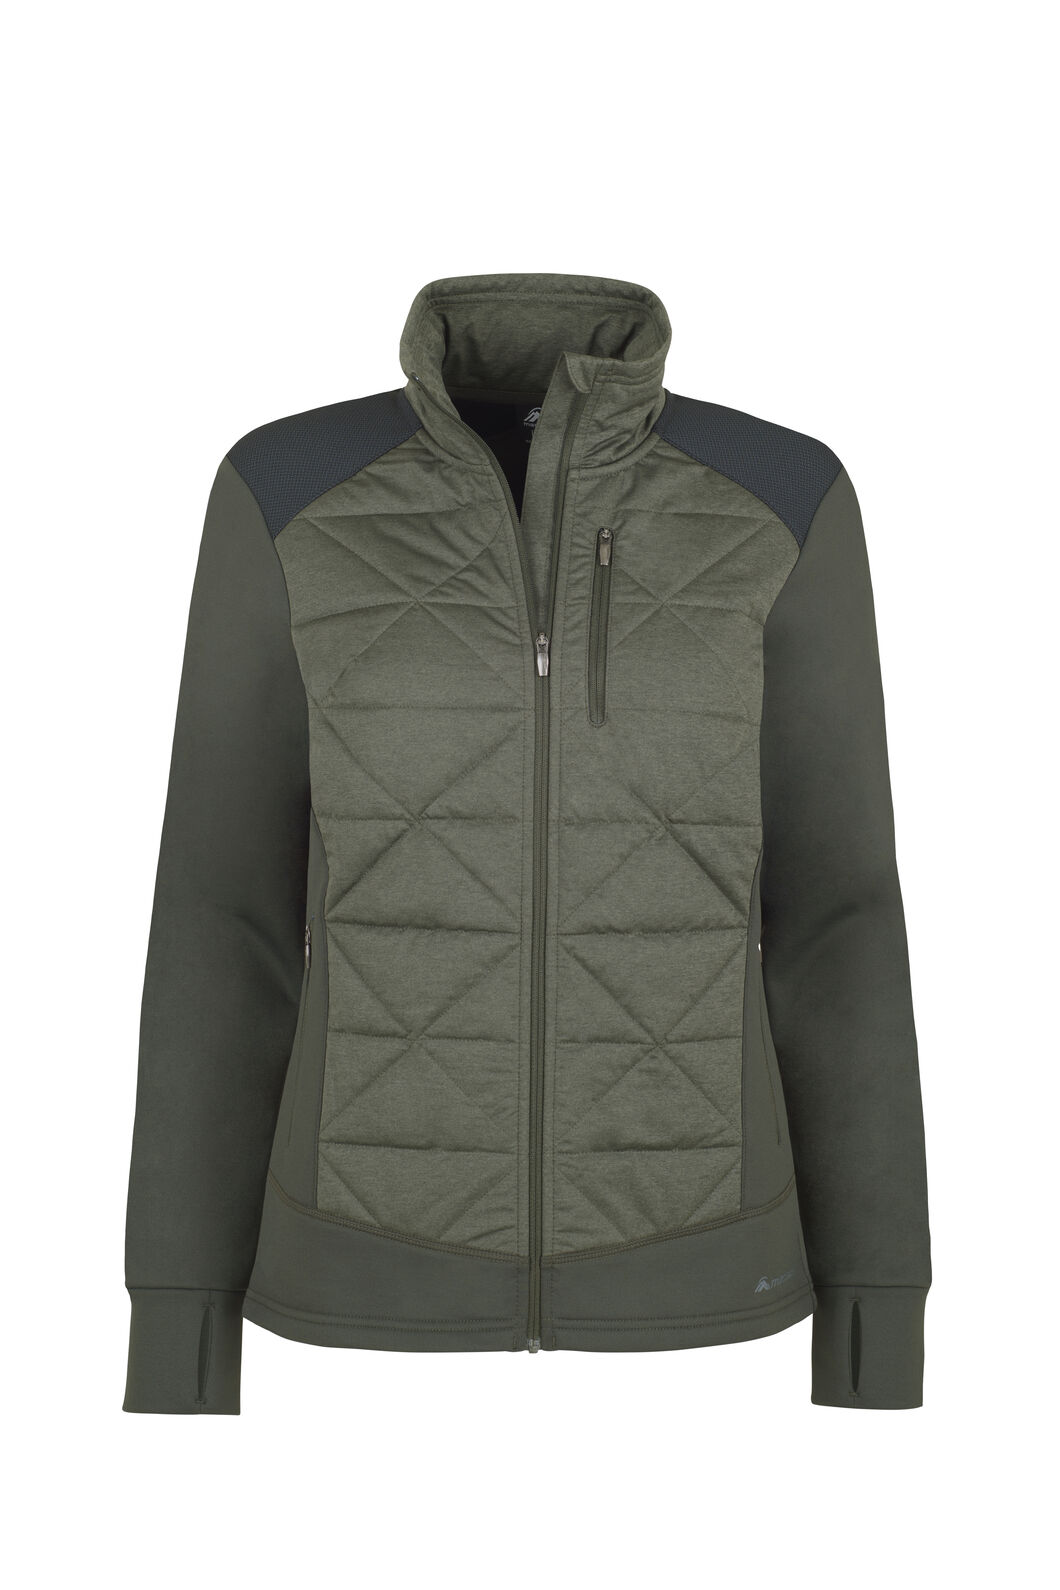 Macpac Accelerate PrimaLoft® Jacket - Women's, Peat, hi-res